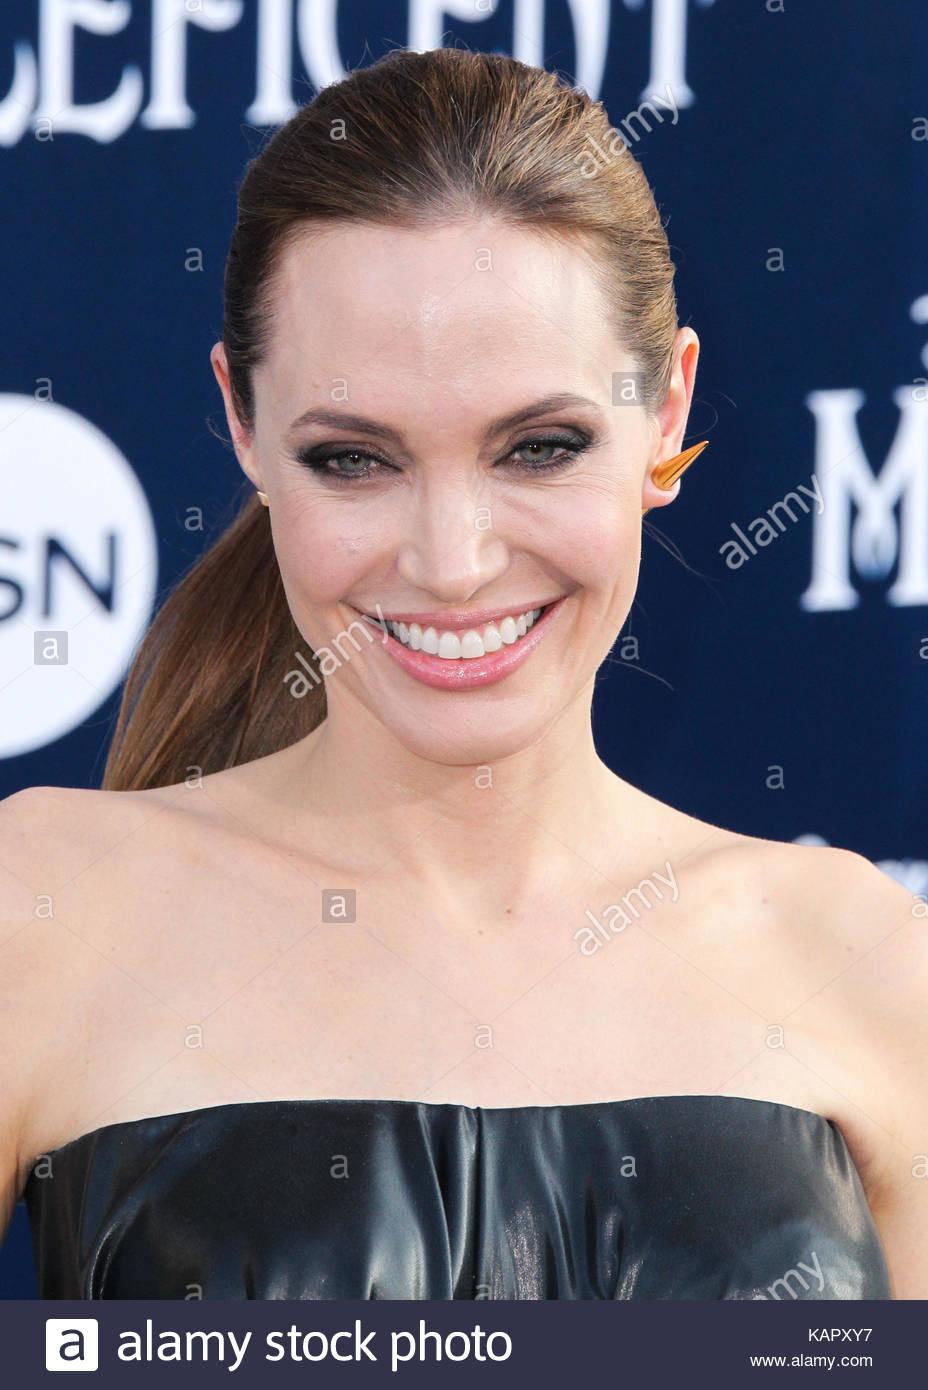 Angelina Jolie Pink Hair